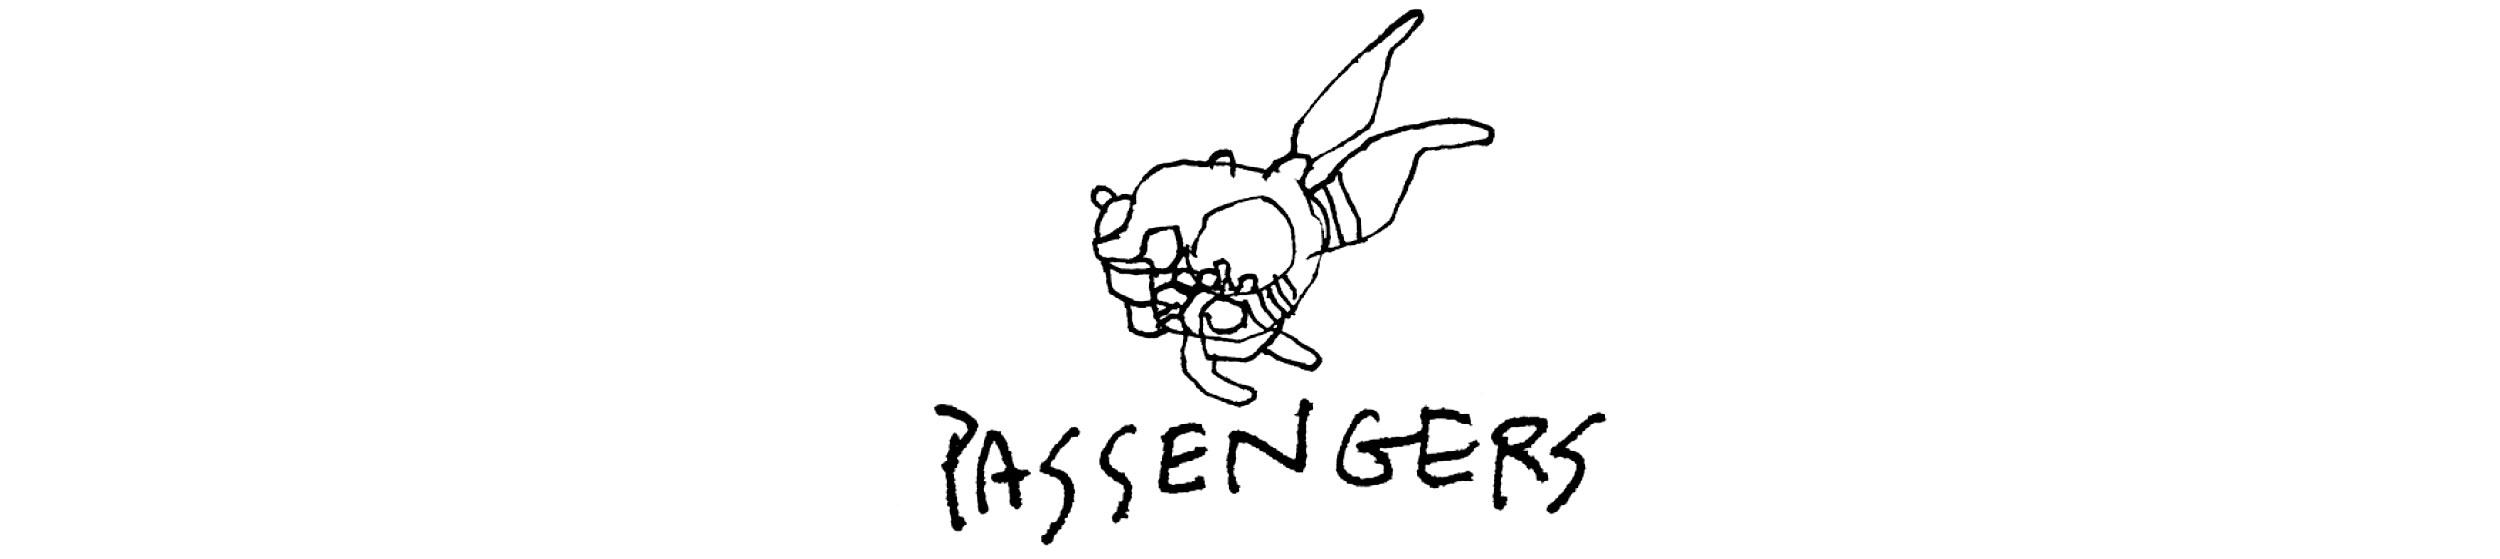 Passengers_intro_image.jpg